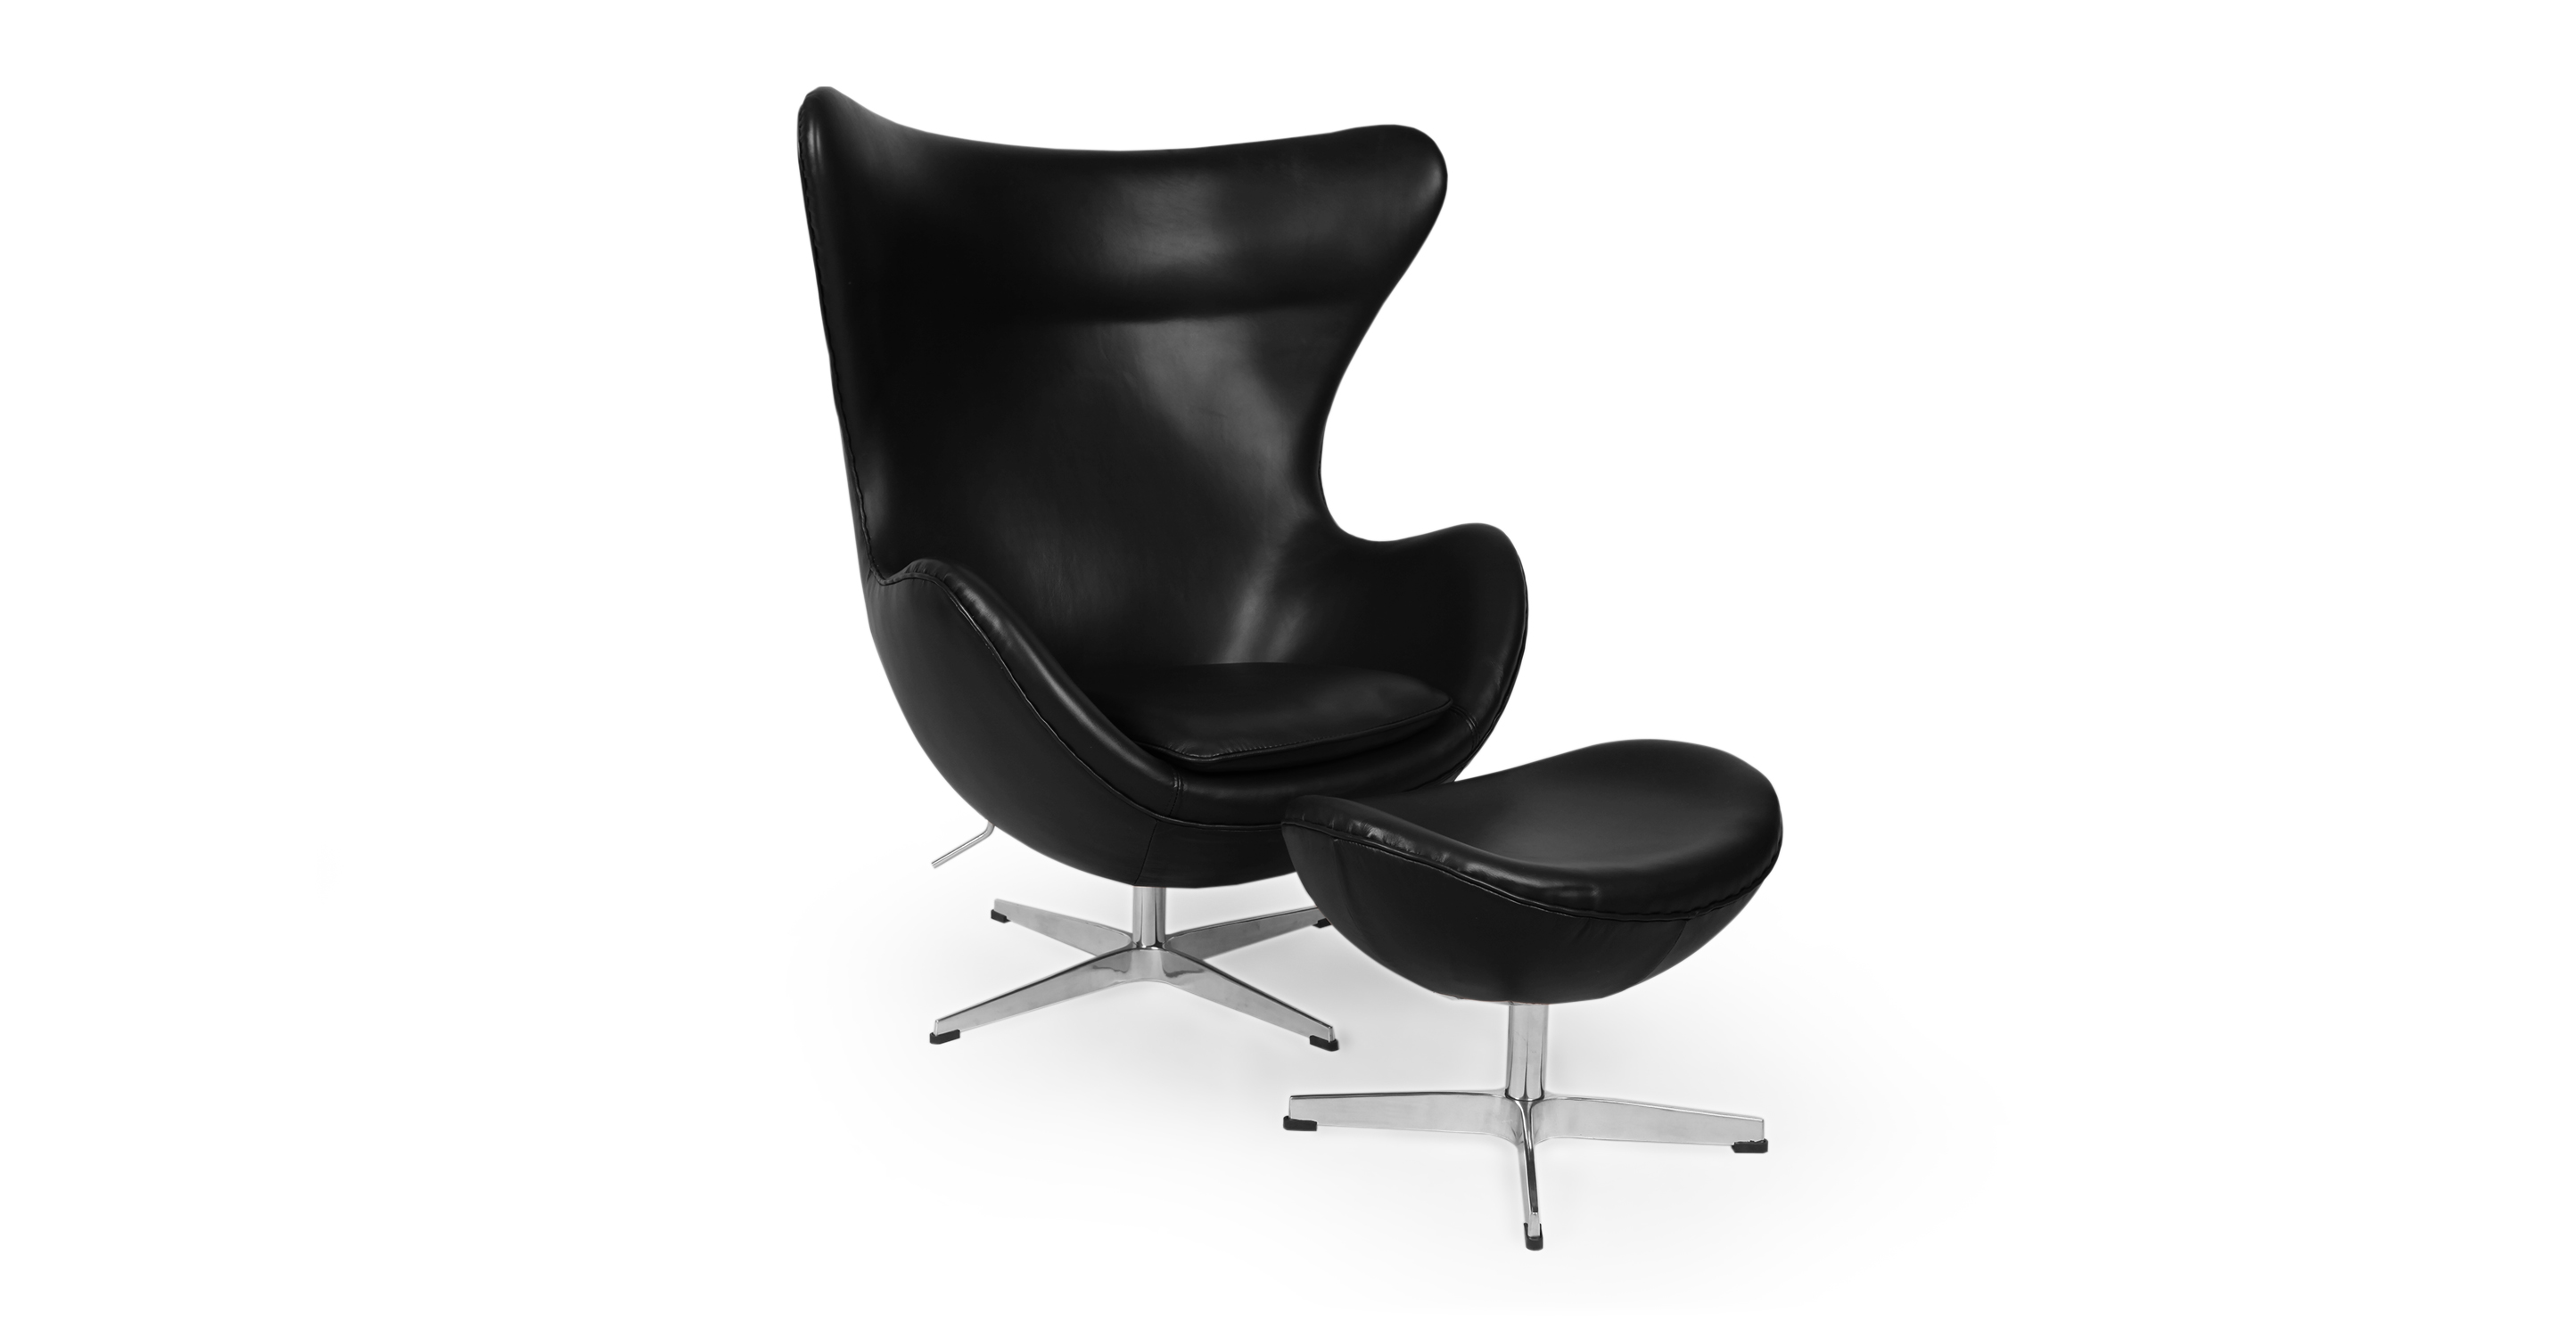 Amoeba Swivel Leather Chair & Ottoman, Black